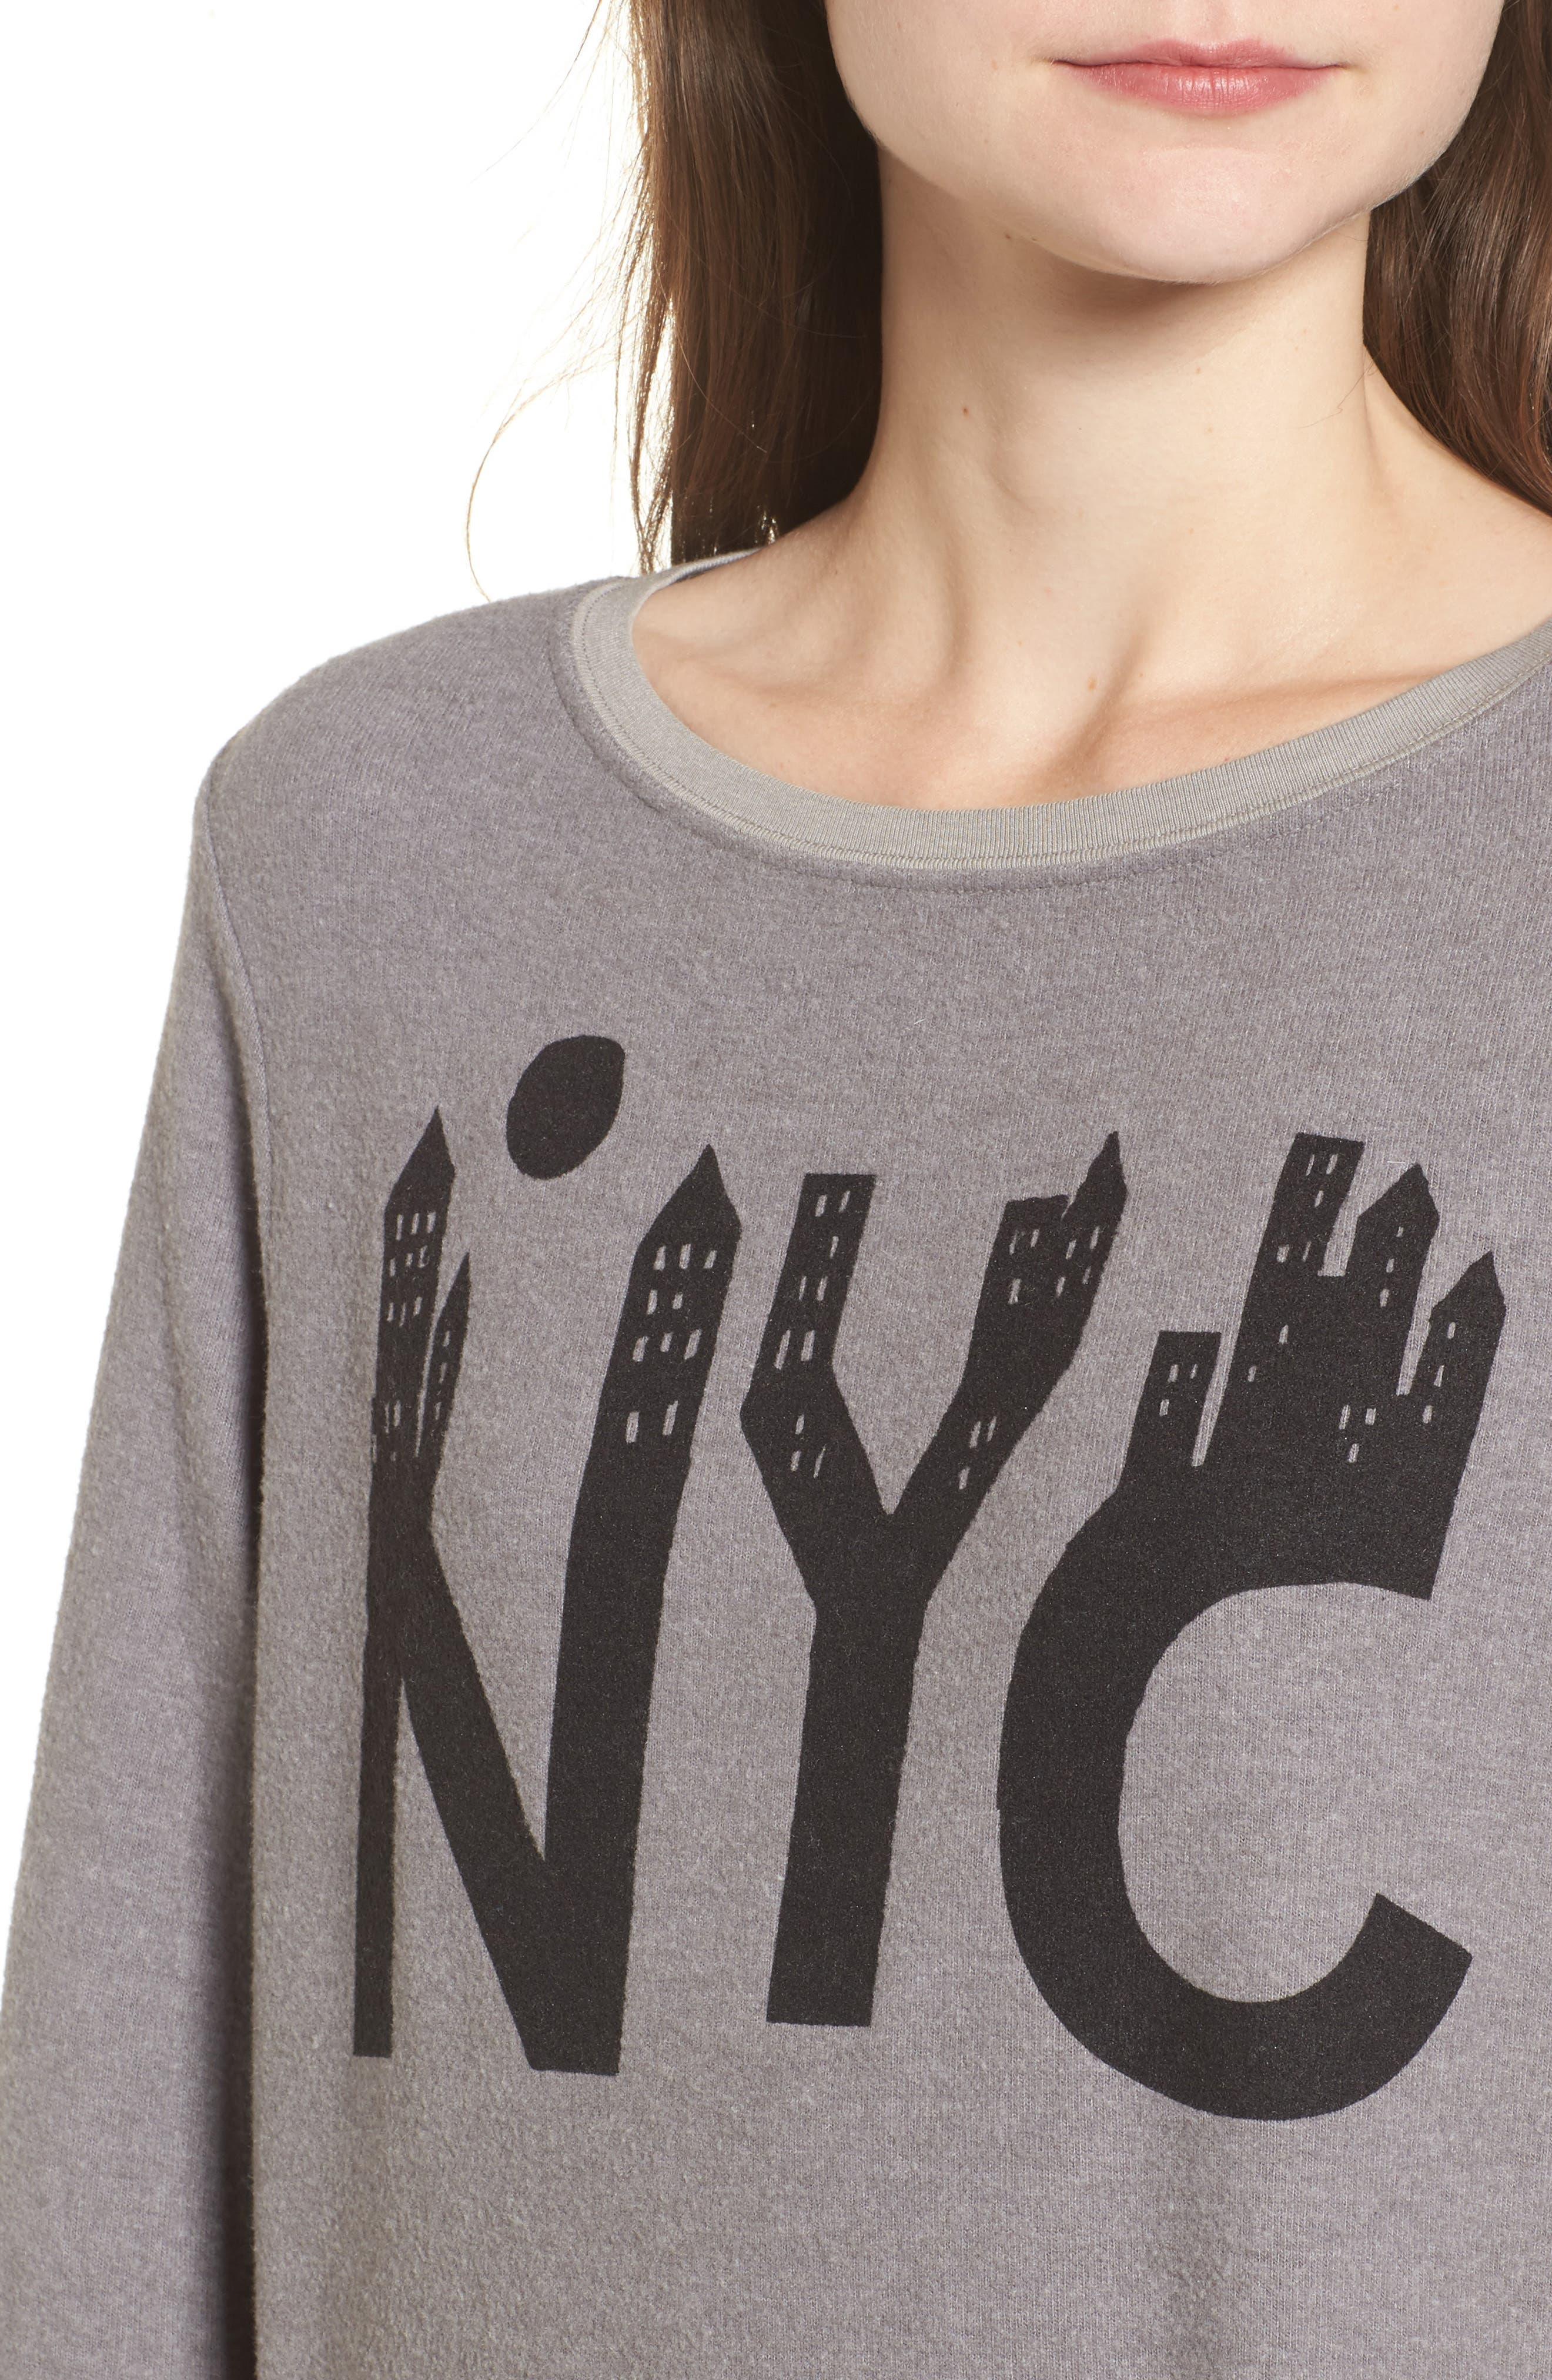 NYC Sweatshirt,                             Alternate thumbnail 4, color,